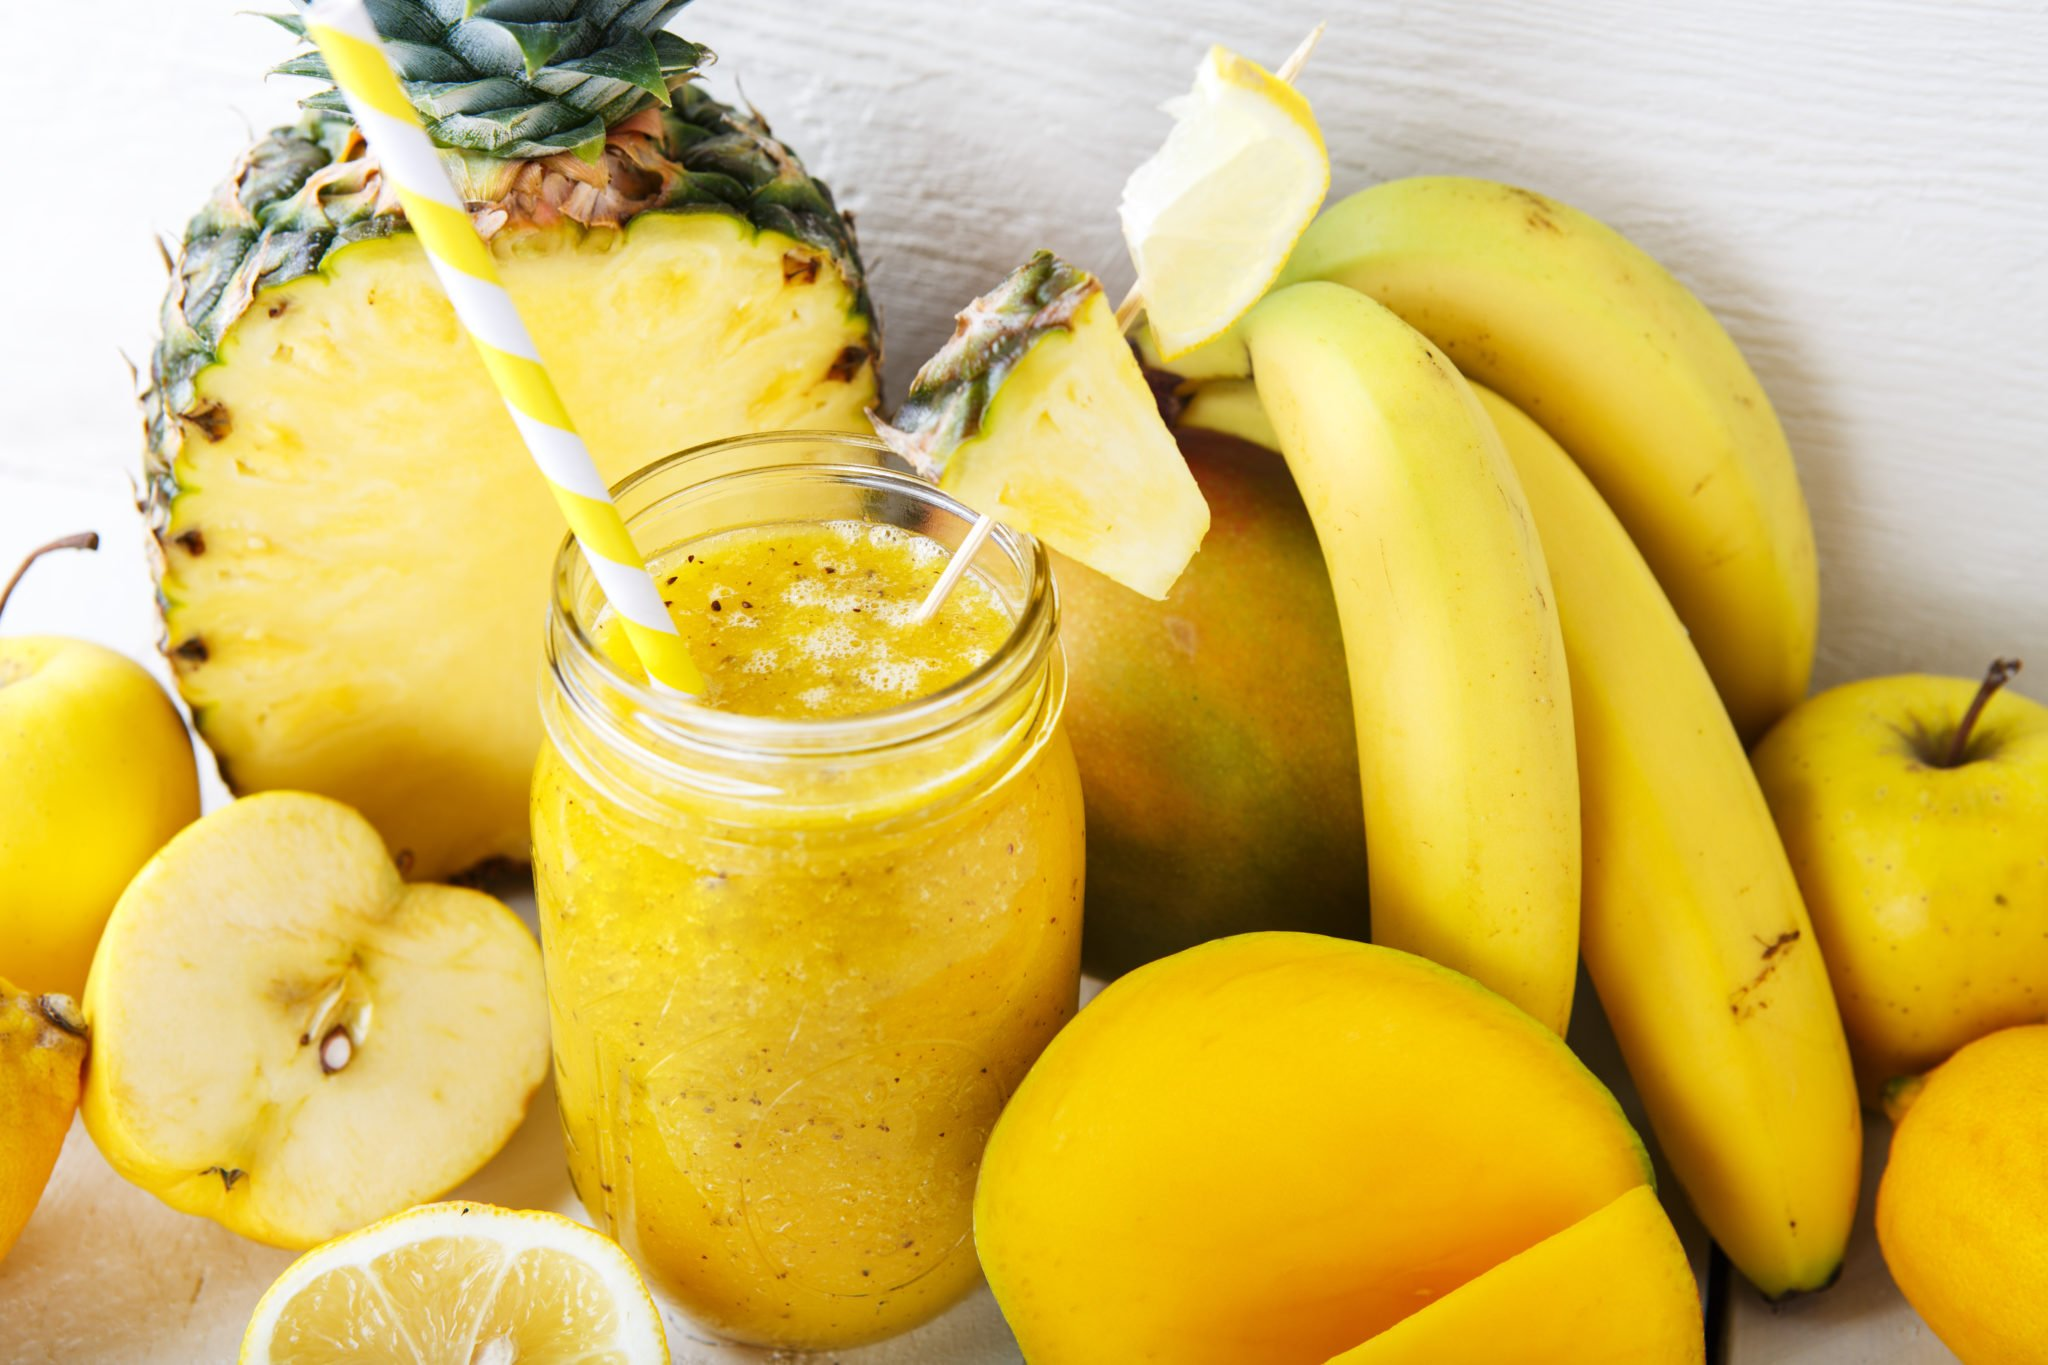 Topicaflood : trolls, viendez HS ! Smoothie-banane-ananas